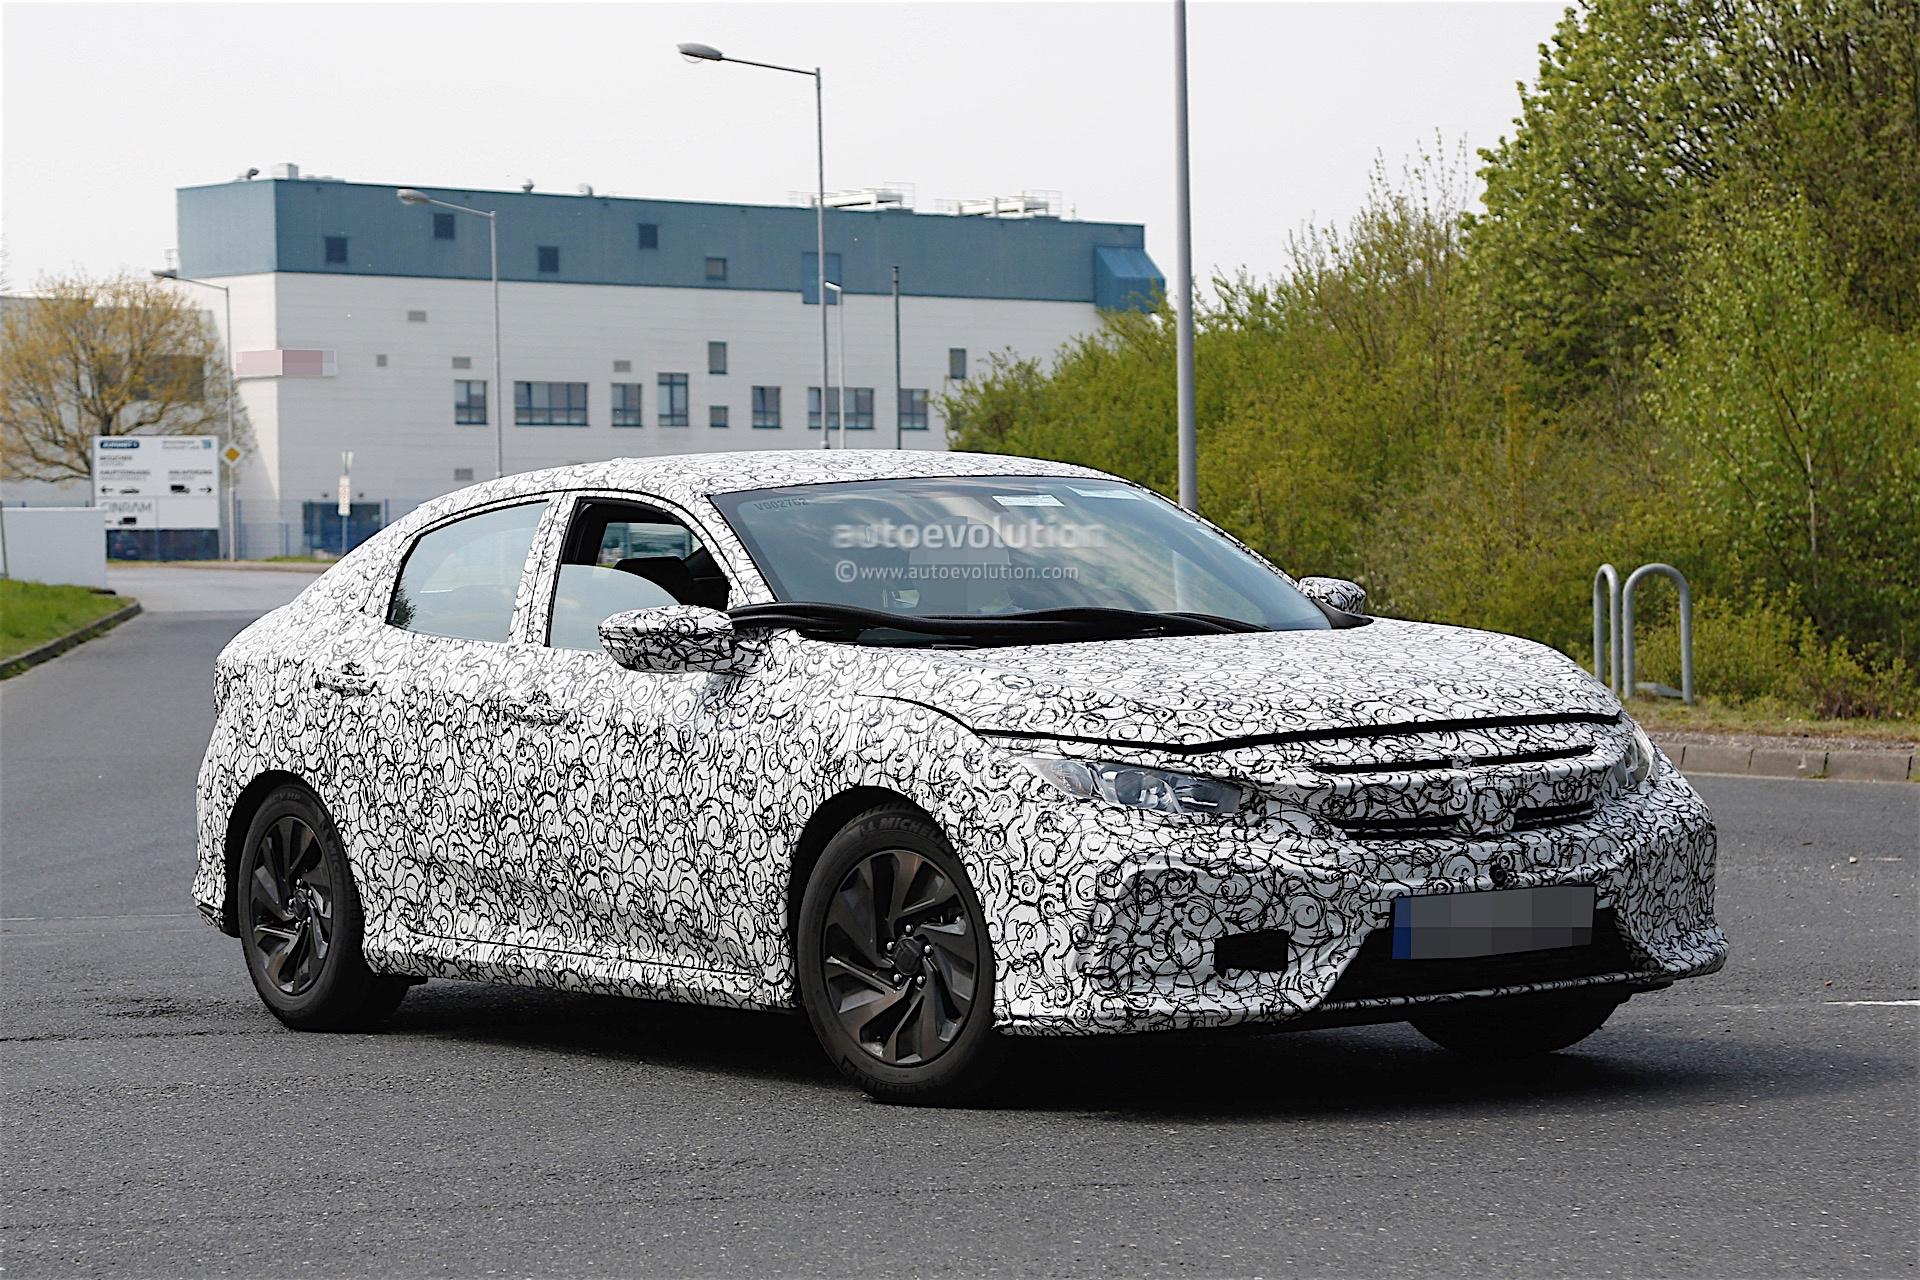 2017 honda civic spyshots reveal interior design   autoevolution